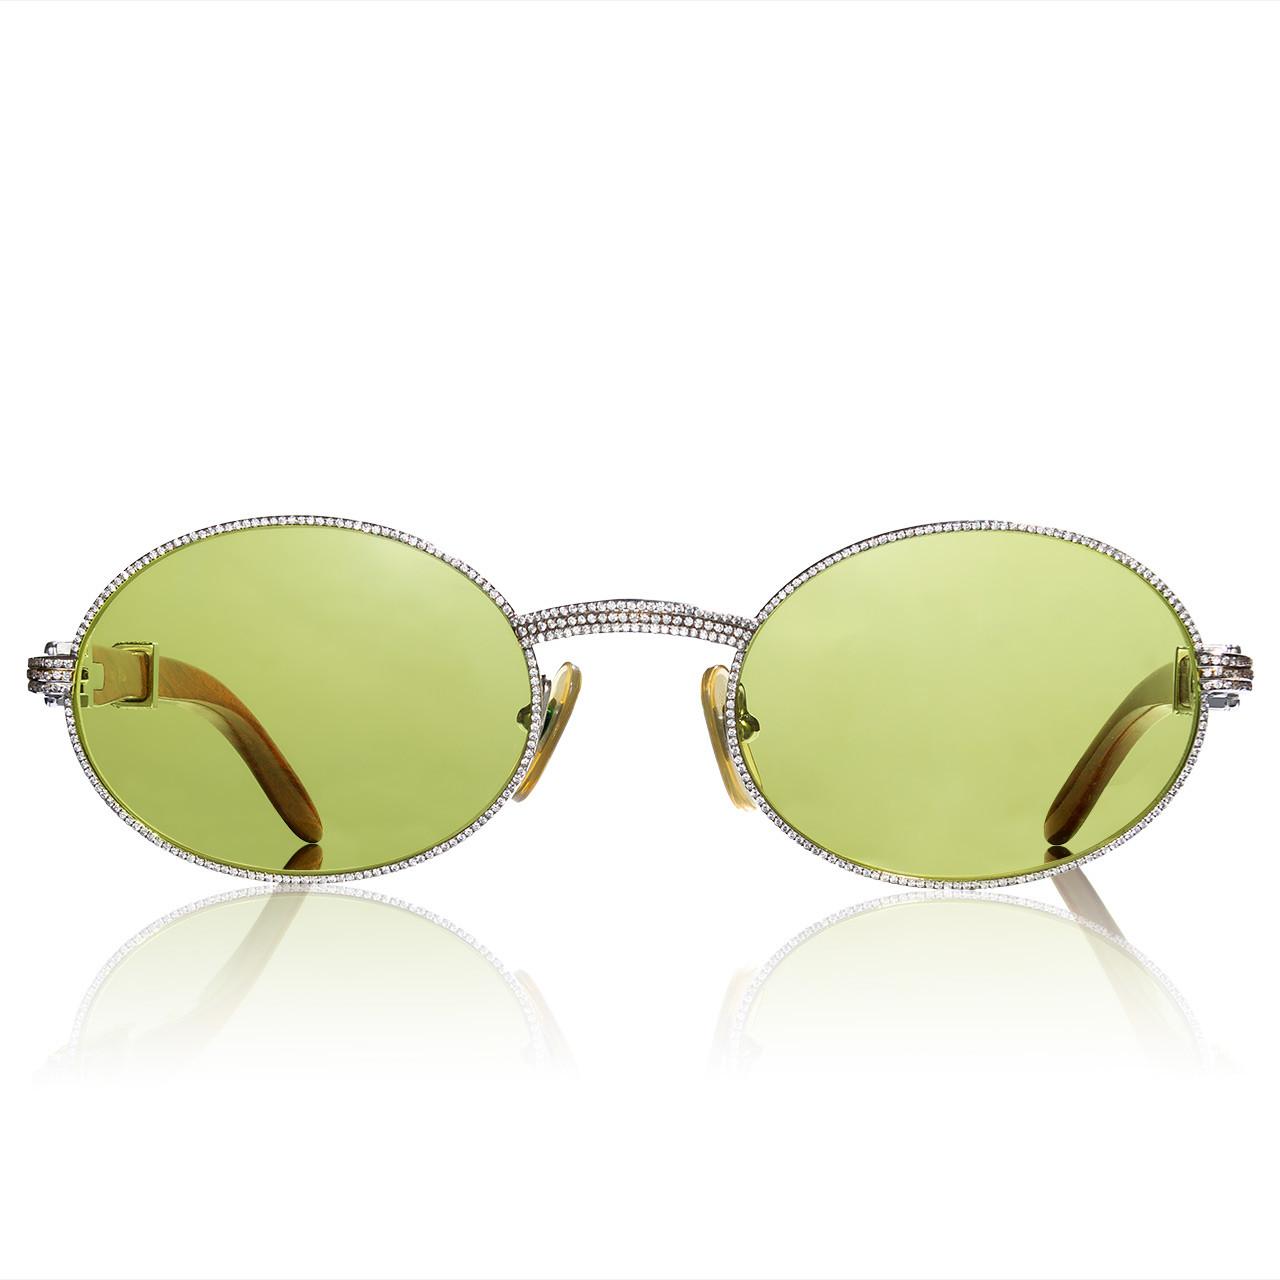 58b4b800c59 Custom Diamond Vintage Cartier Giverny Glasses - Shyne Jewelers